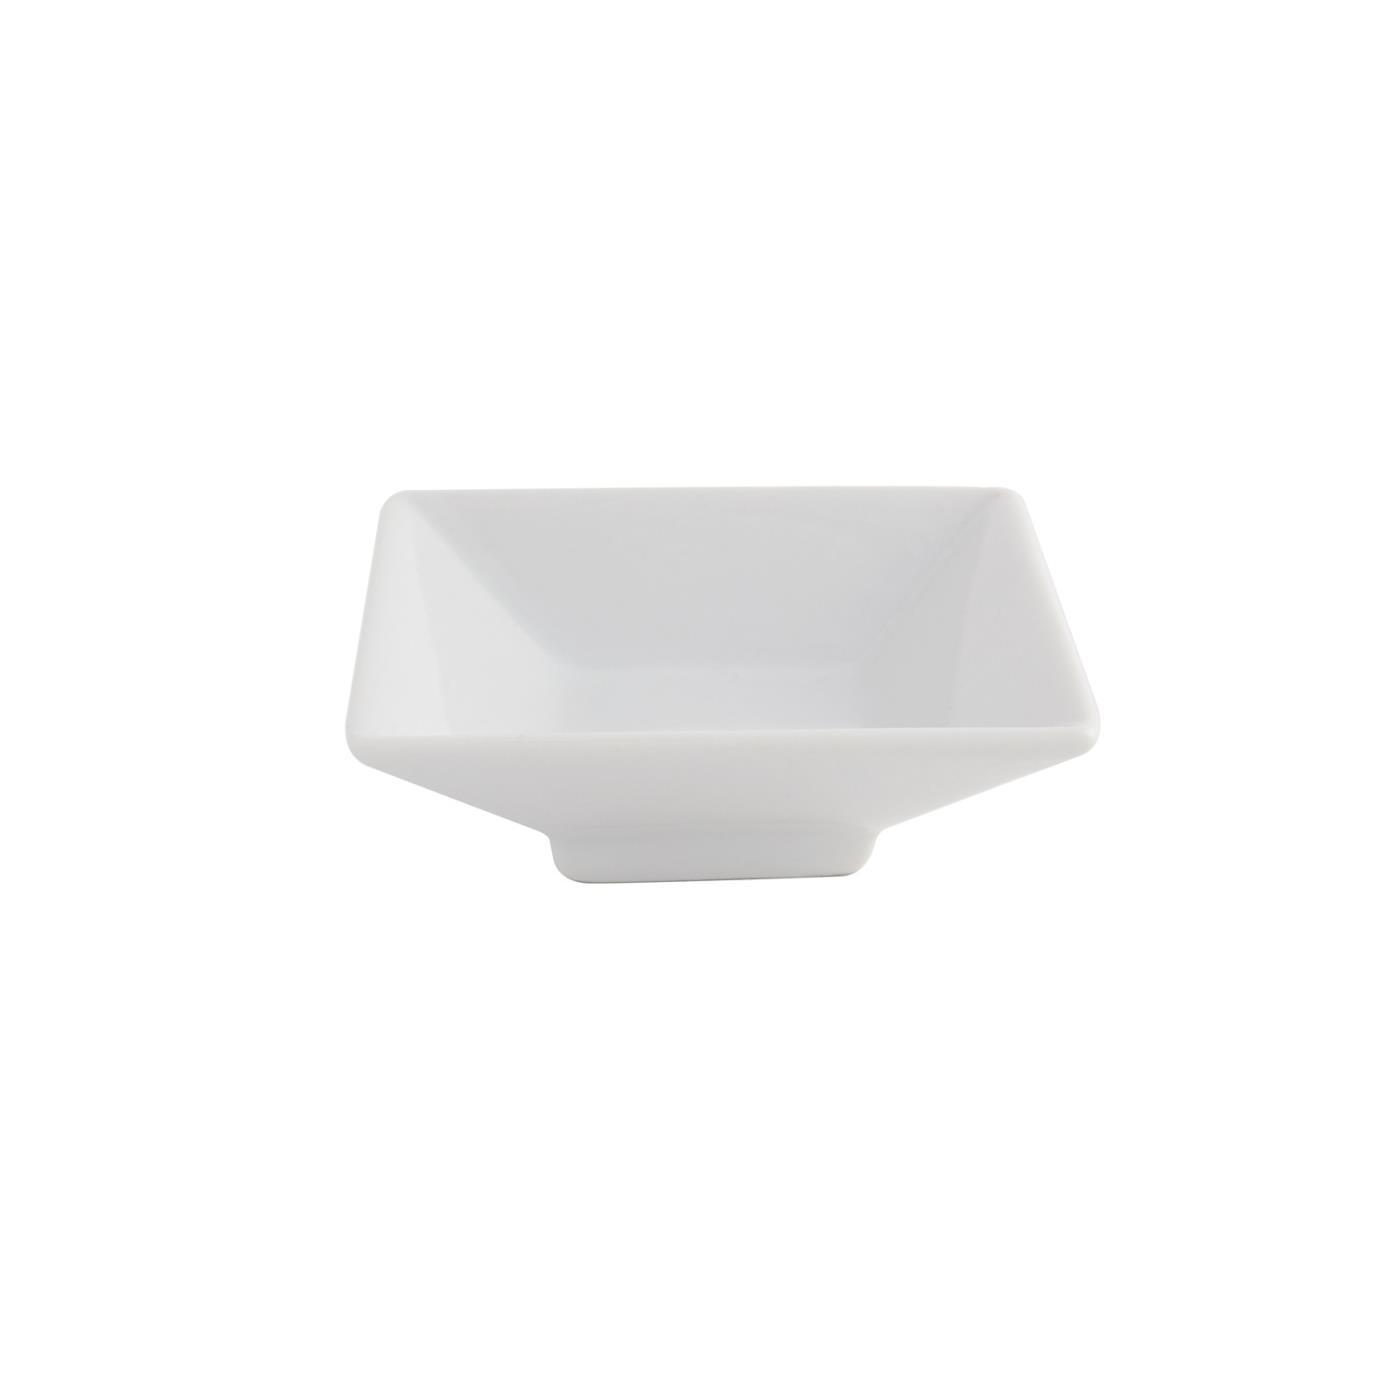 "White Square Pedestal Dish - 3"""